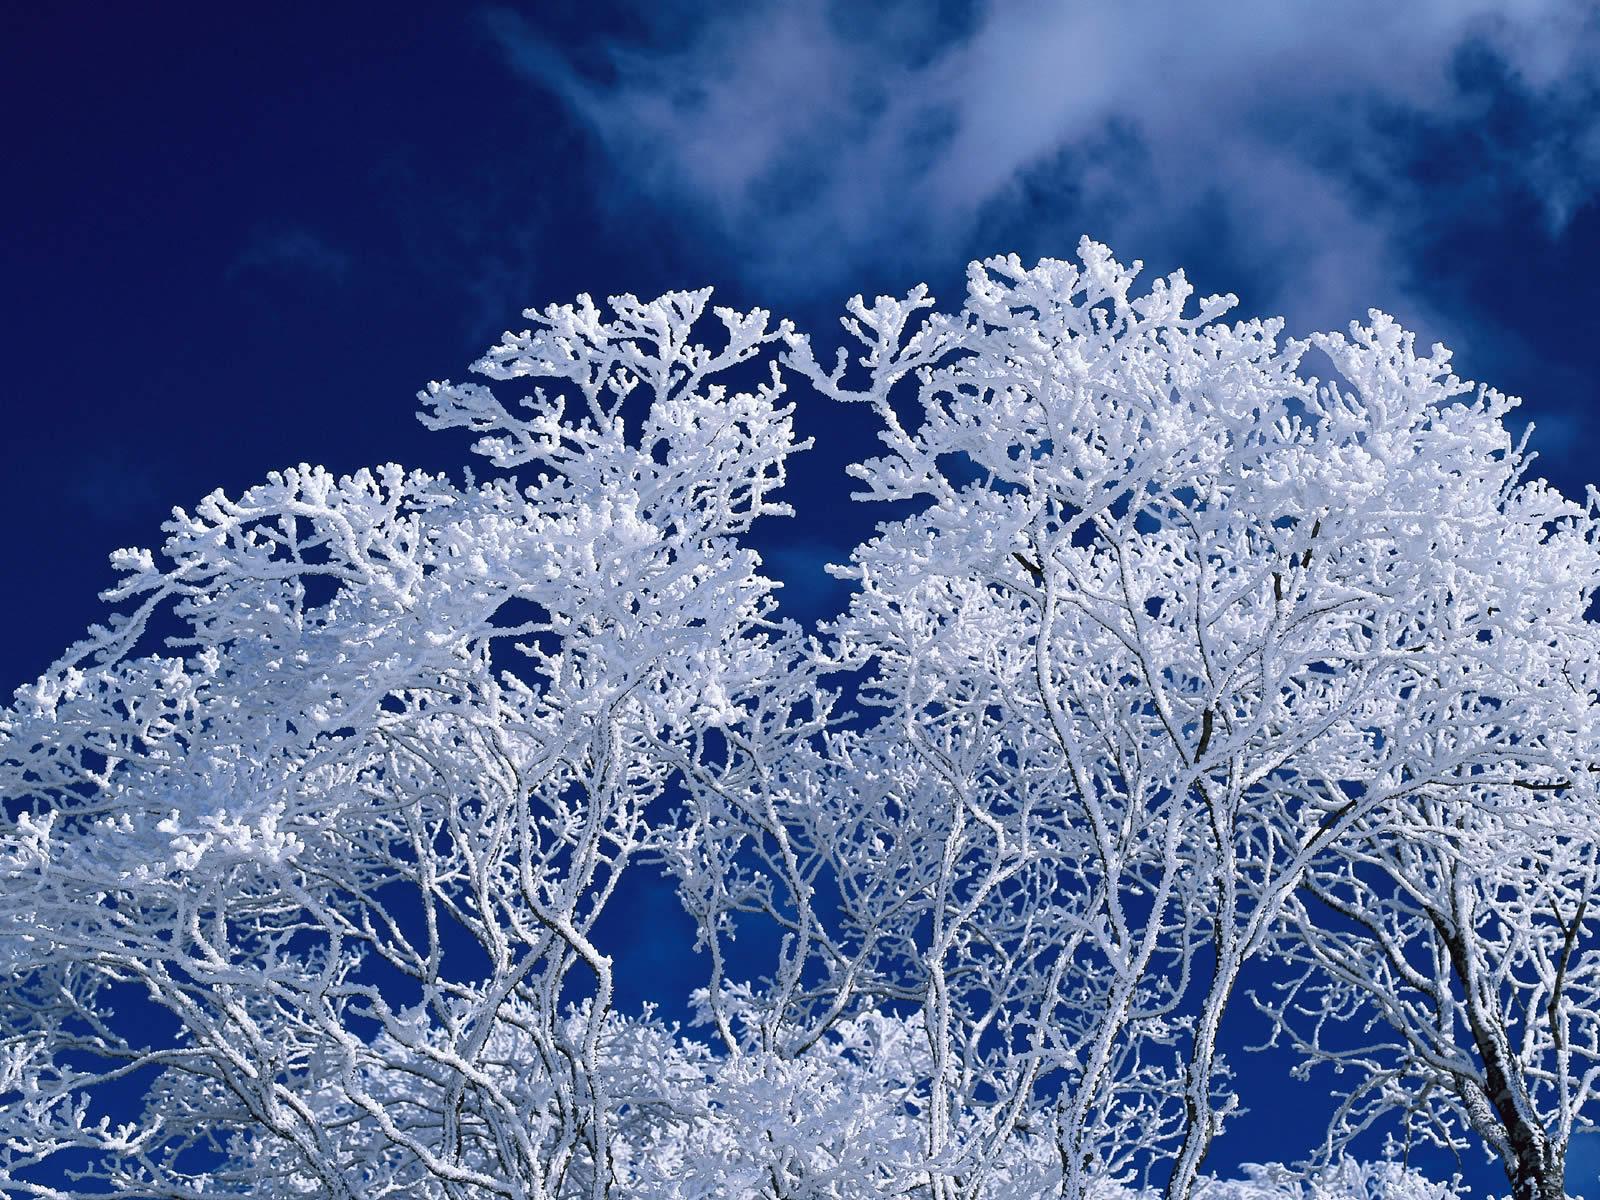 frost wallpaper 1080p